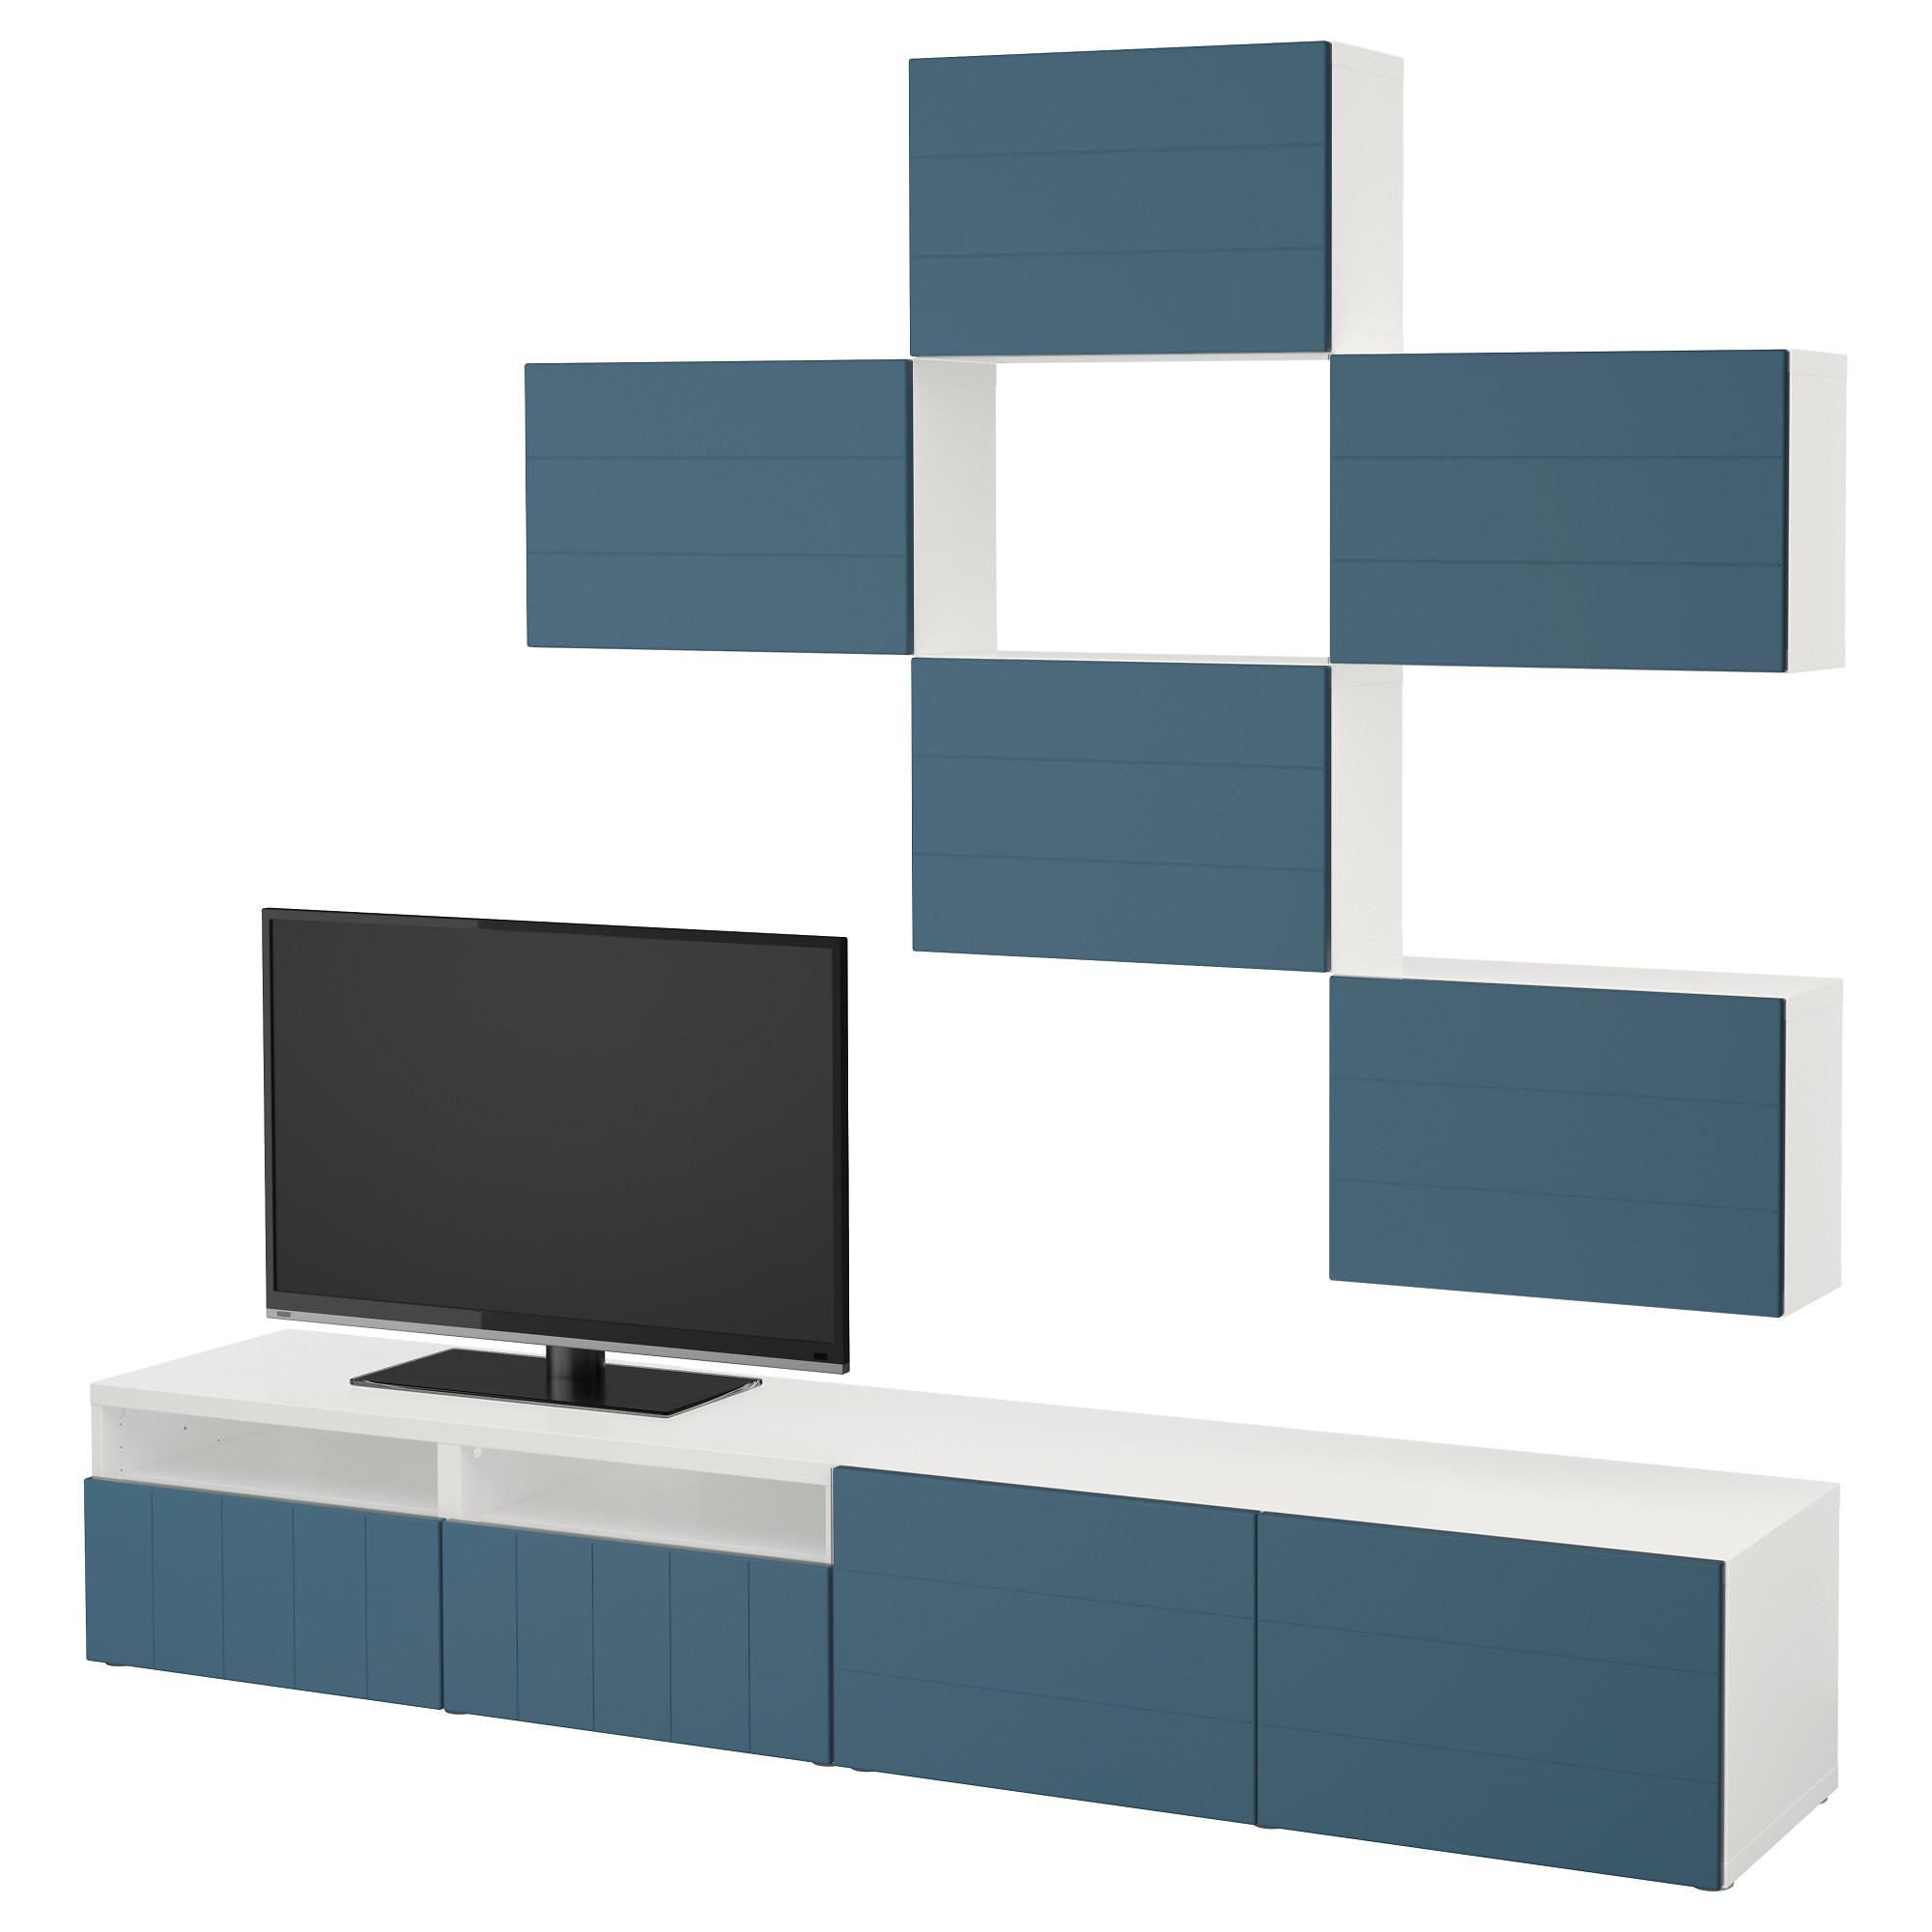 Шкаф для ТВ, комбинация БЕСТО темно-синий артикуль № 892.761.23 в наличии. Онлайн сайт IKEA Республика Беларусь. Недорогая доставка и установка.